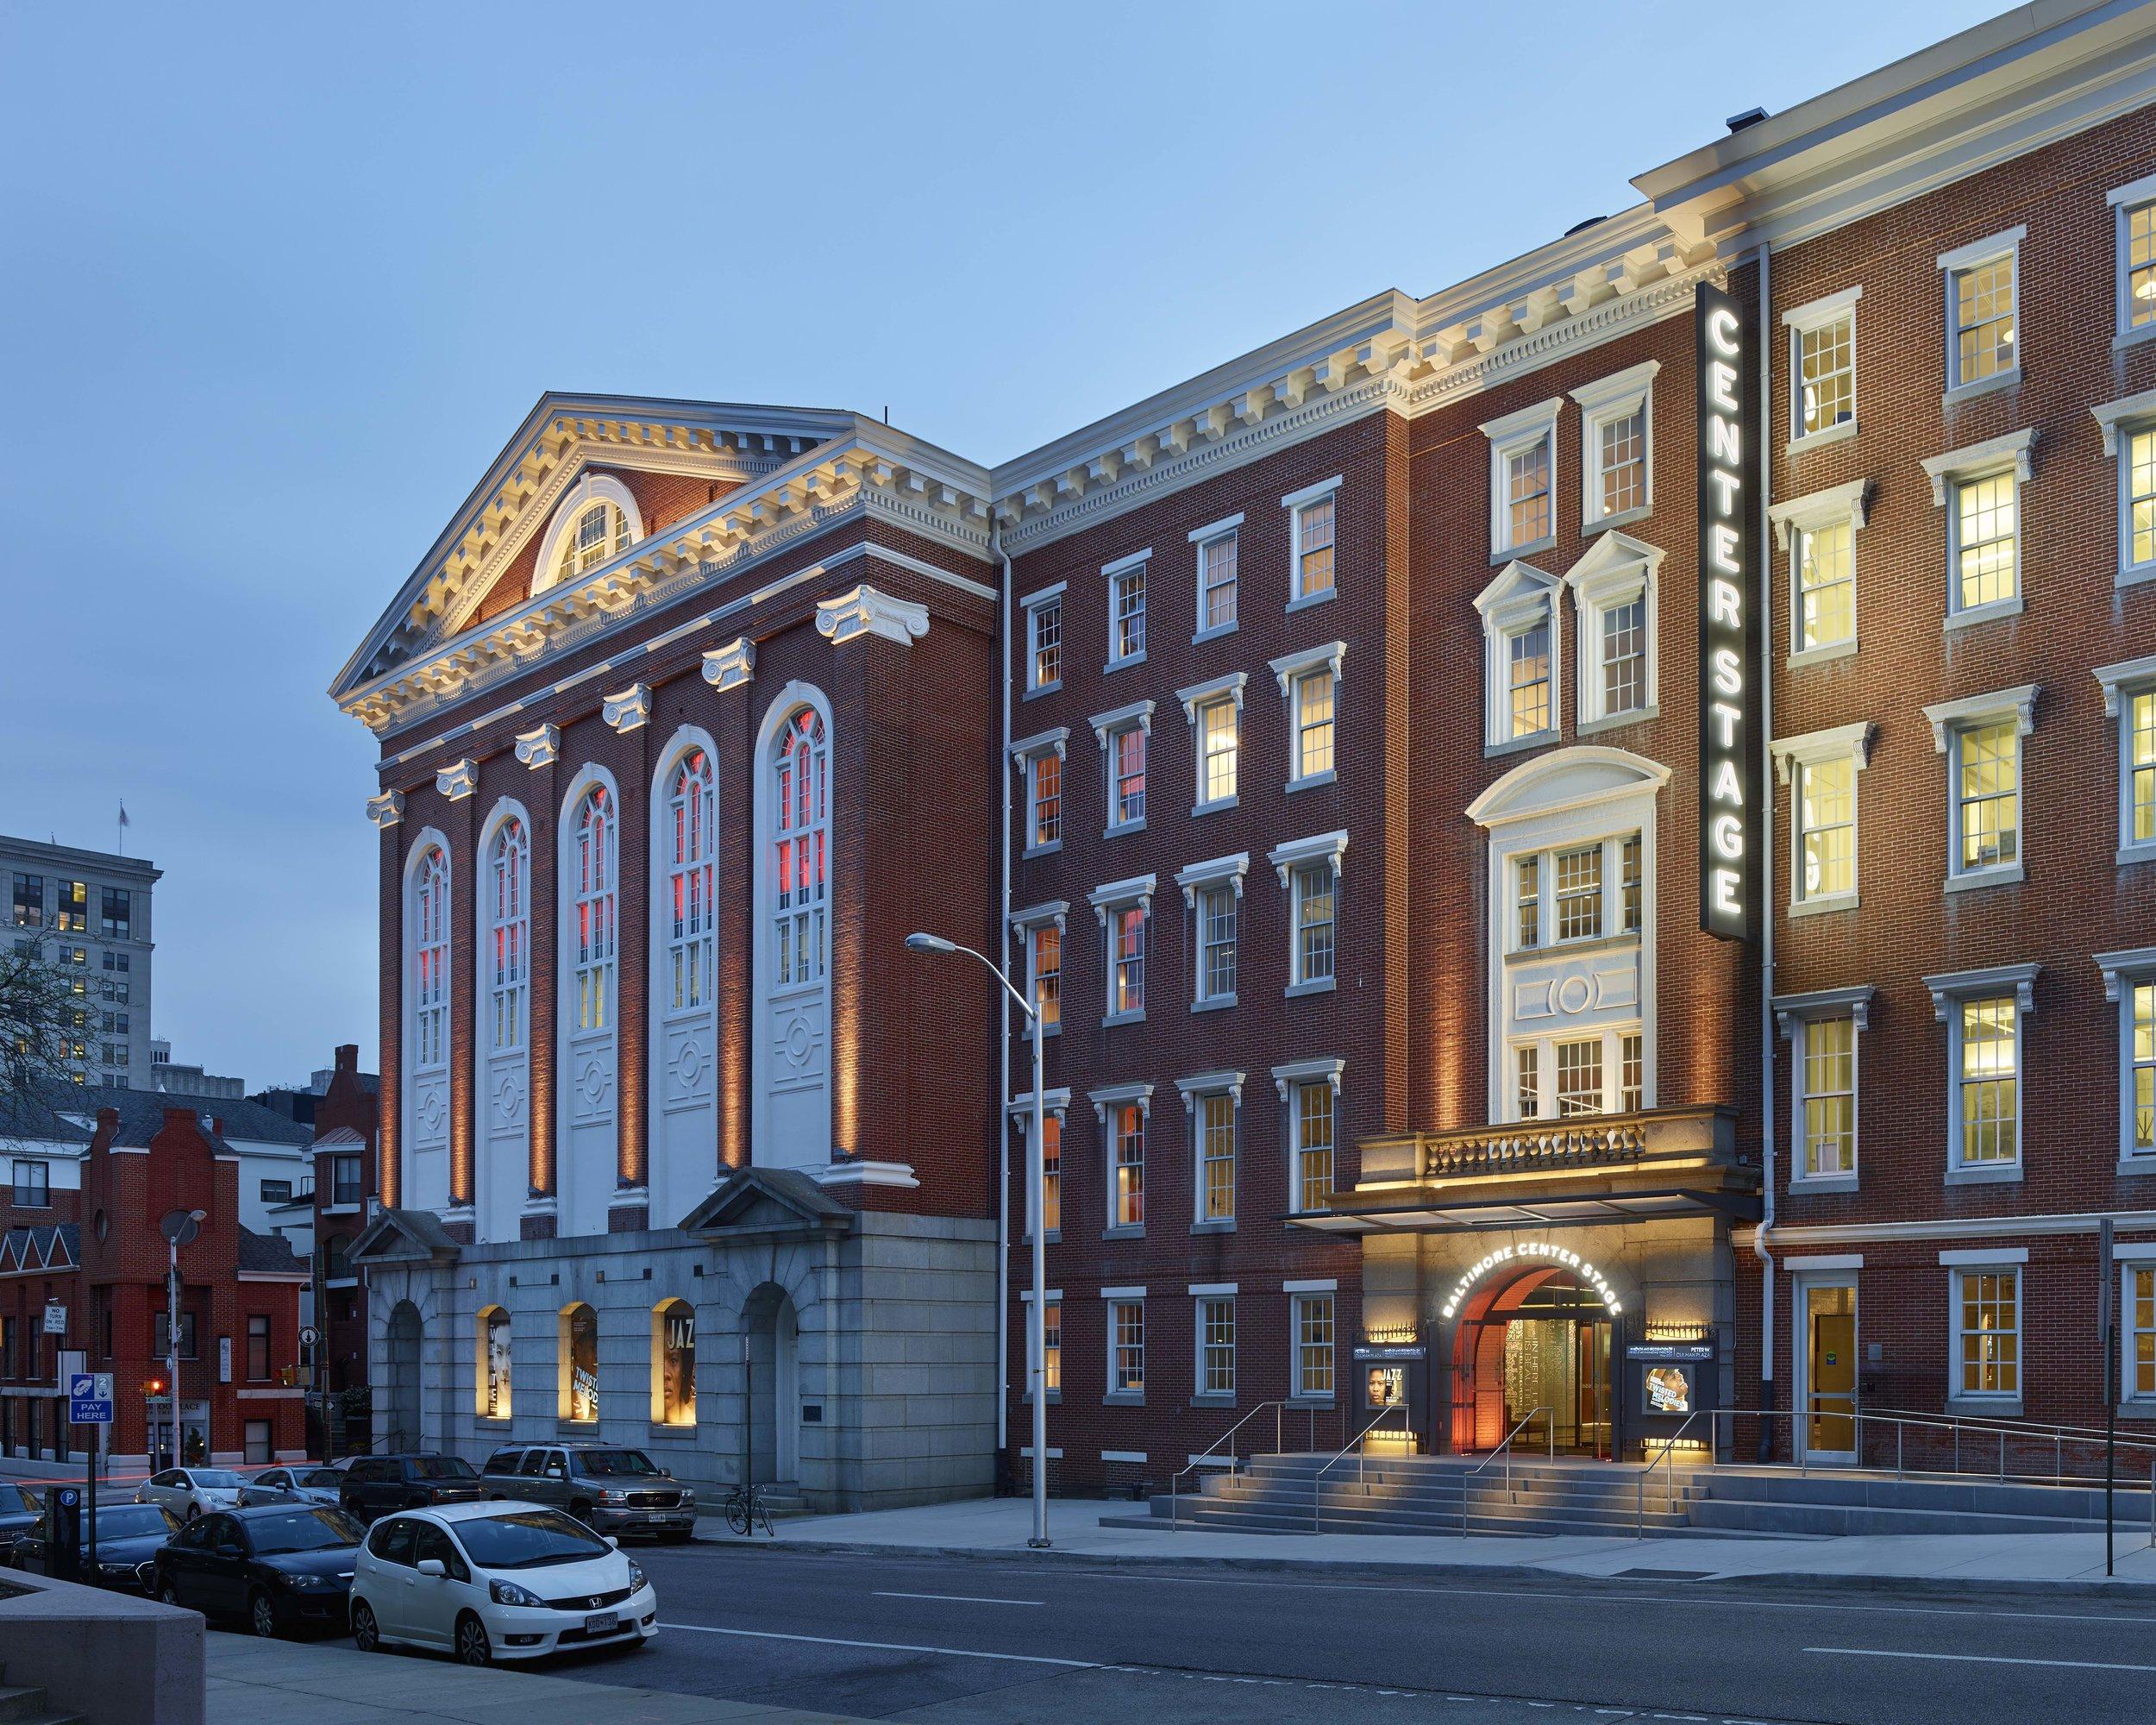 Baltimore Center Stage  Pentagram - Abbott Miller Baltimore, MD